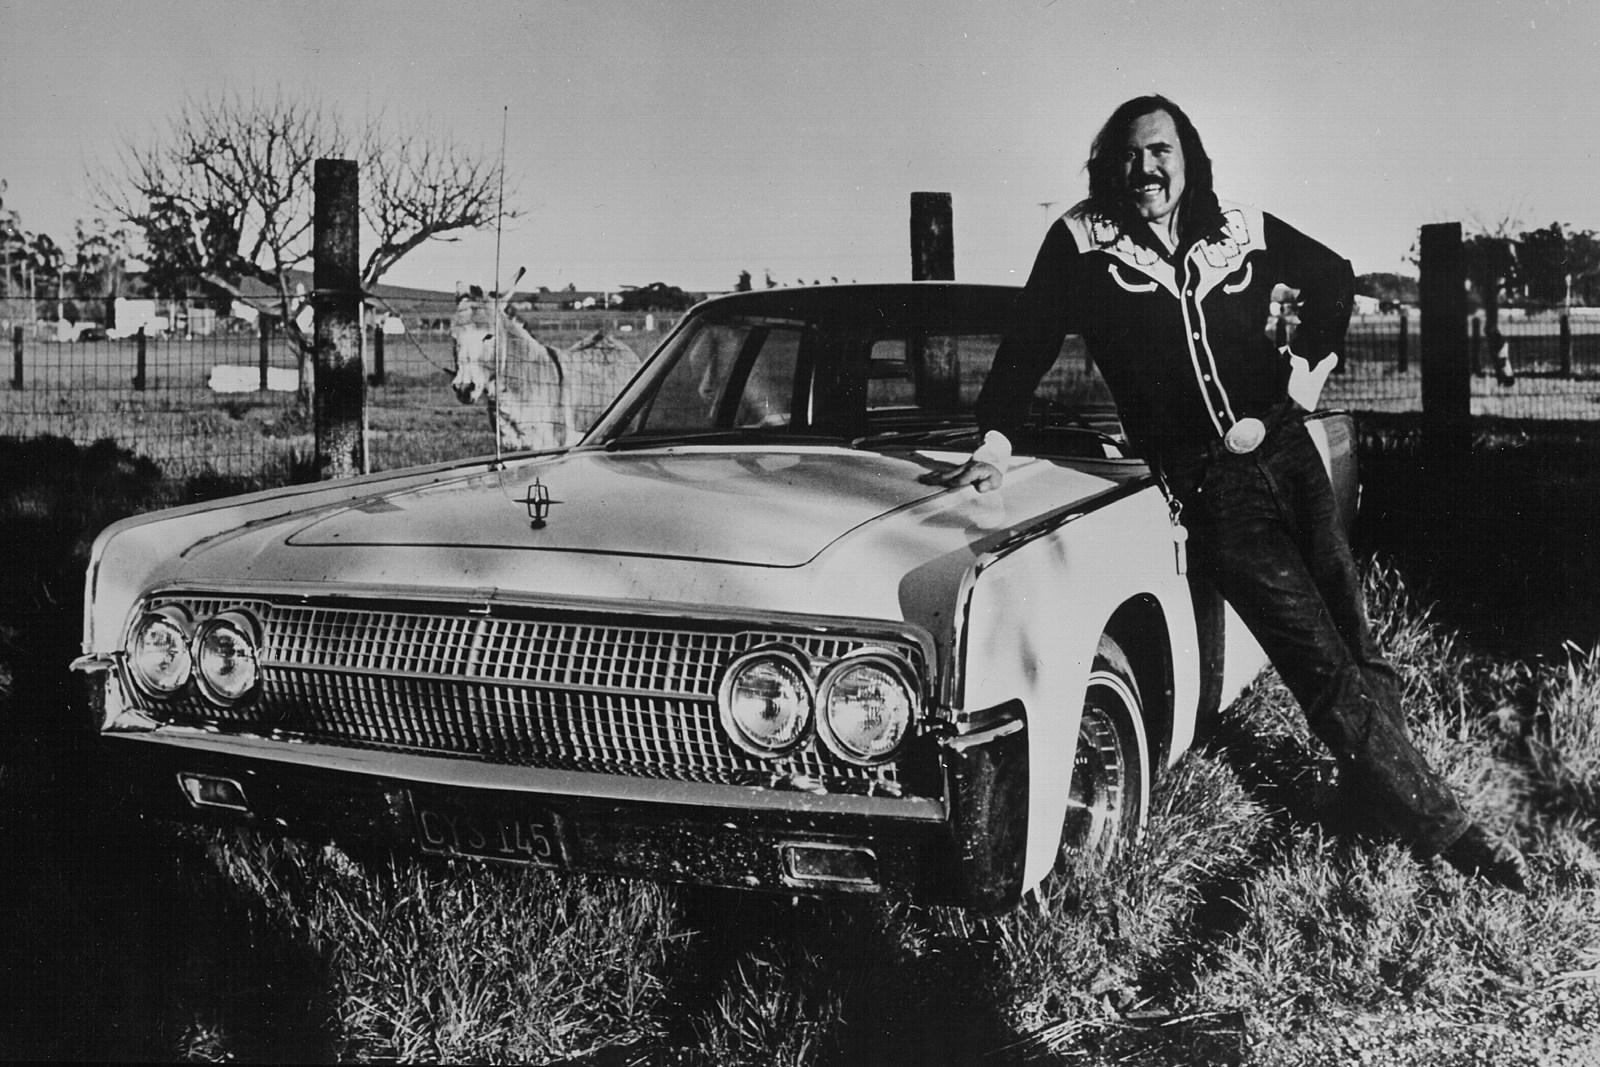 George Frayne, 'Commander Cody,' Country-Rock Pioneer Dead at 77